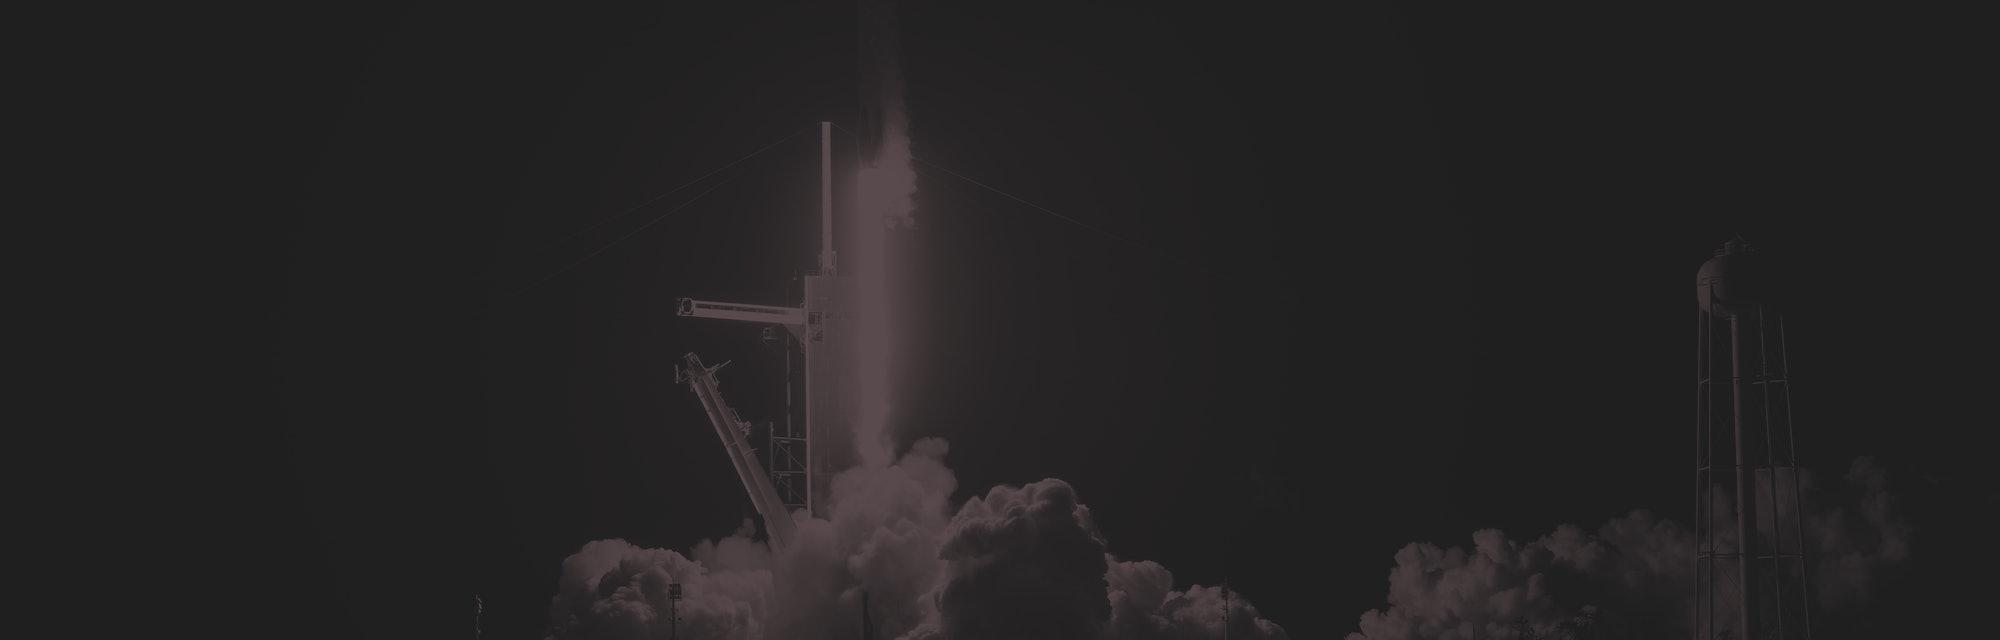 SpaceX Crew Dragon liftoff